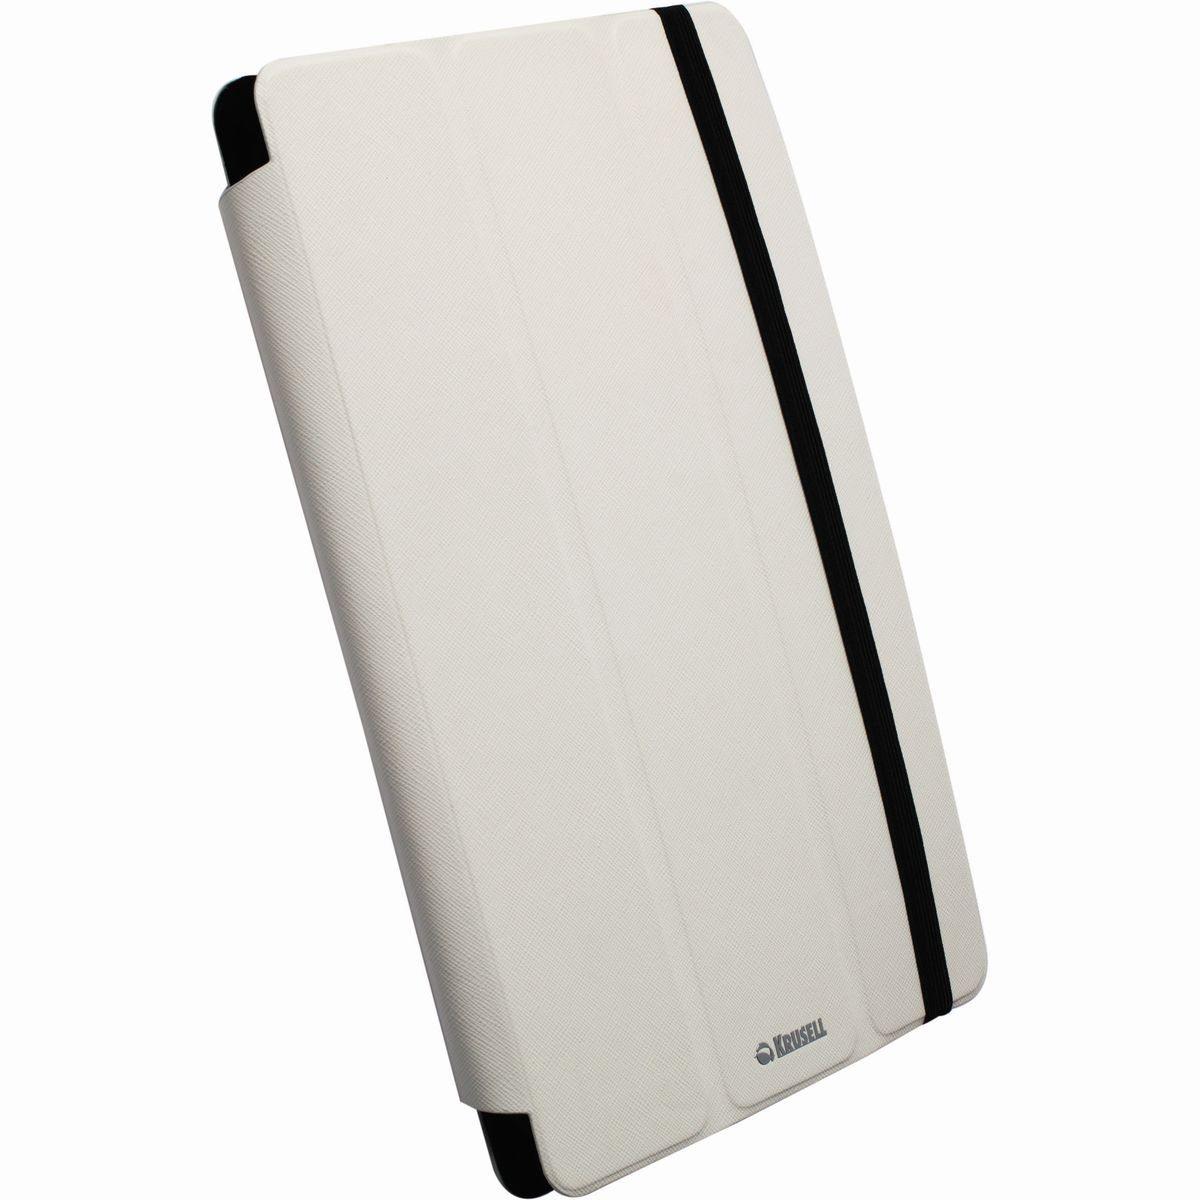 "Krusell Tablettasche »Tablet Case Malmö, Universal 8"" - 10.1"", Weiß«"